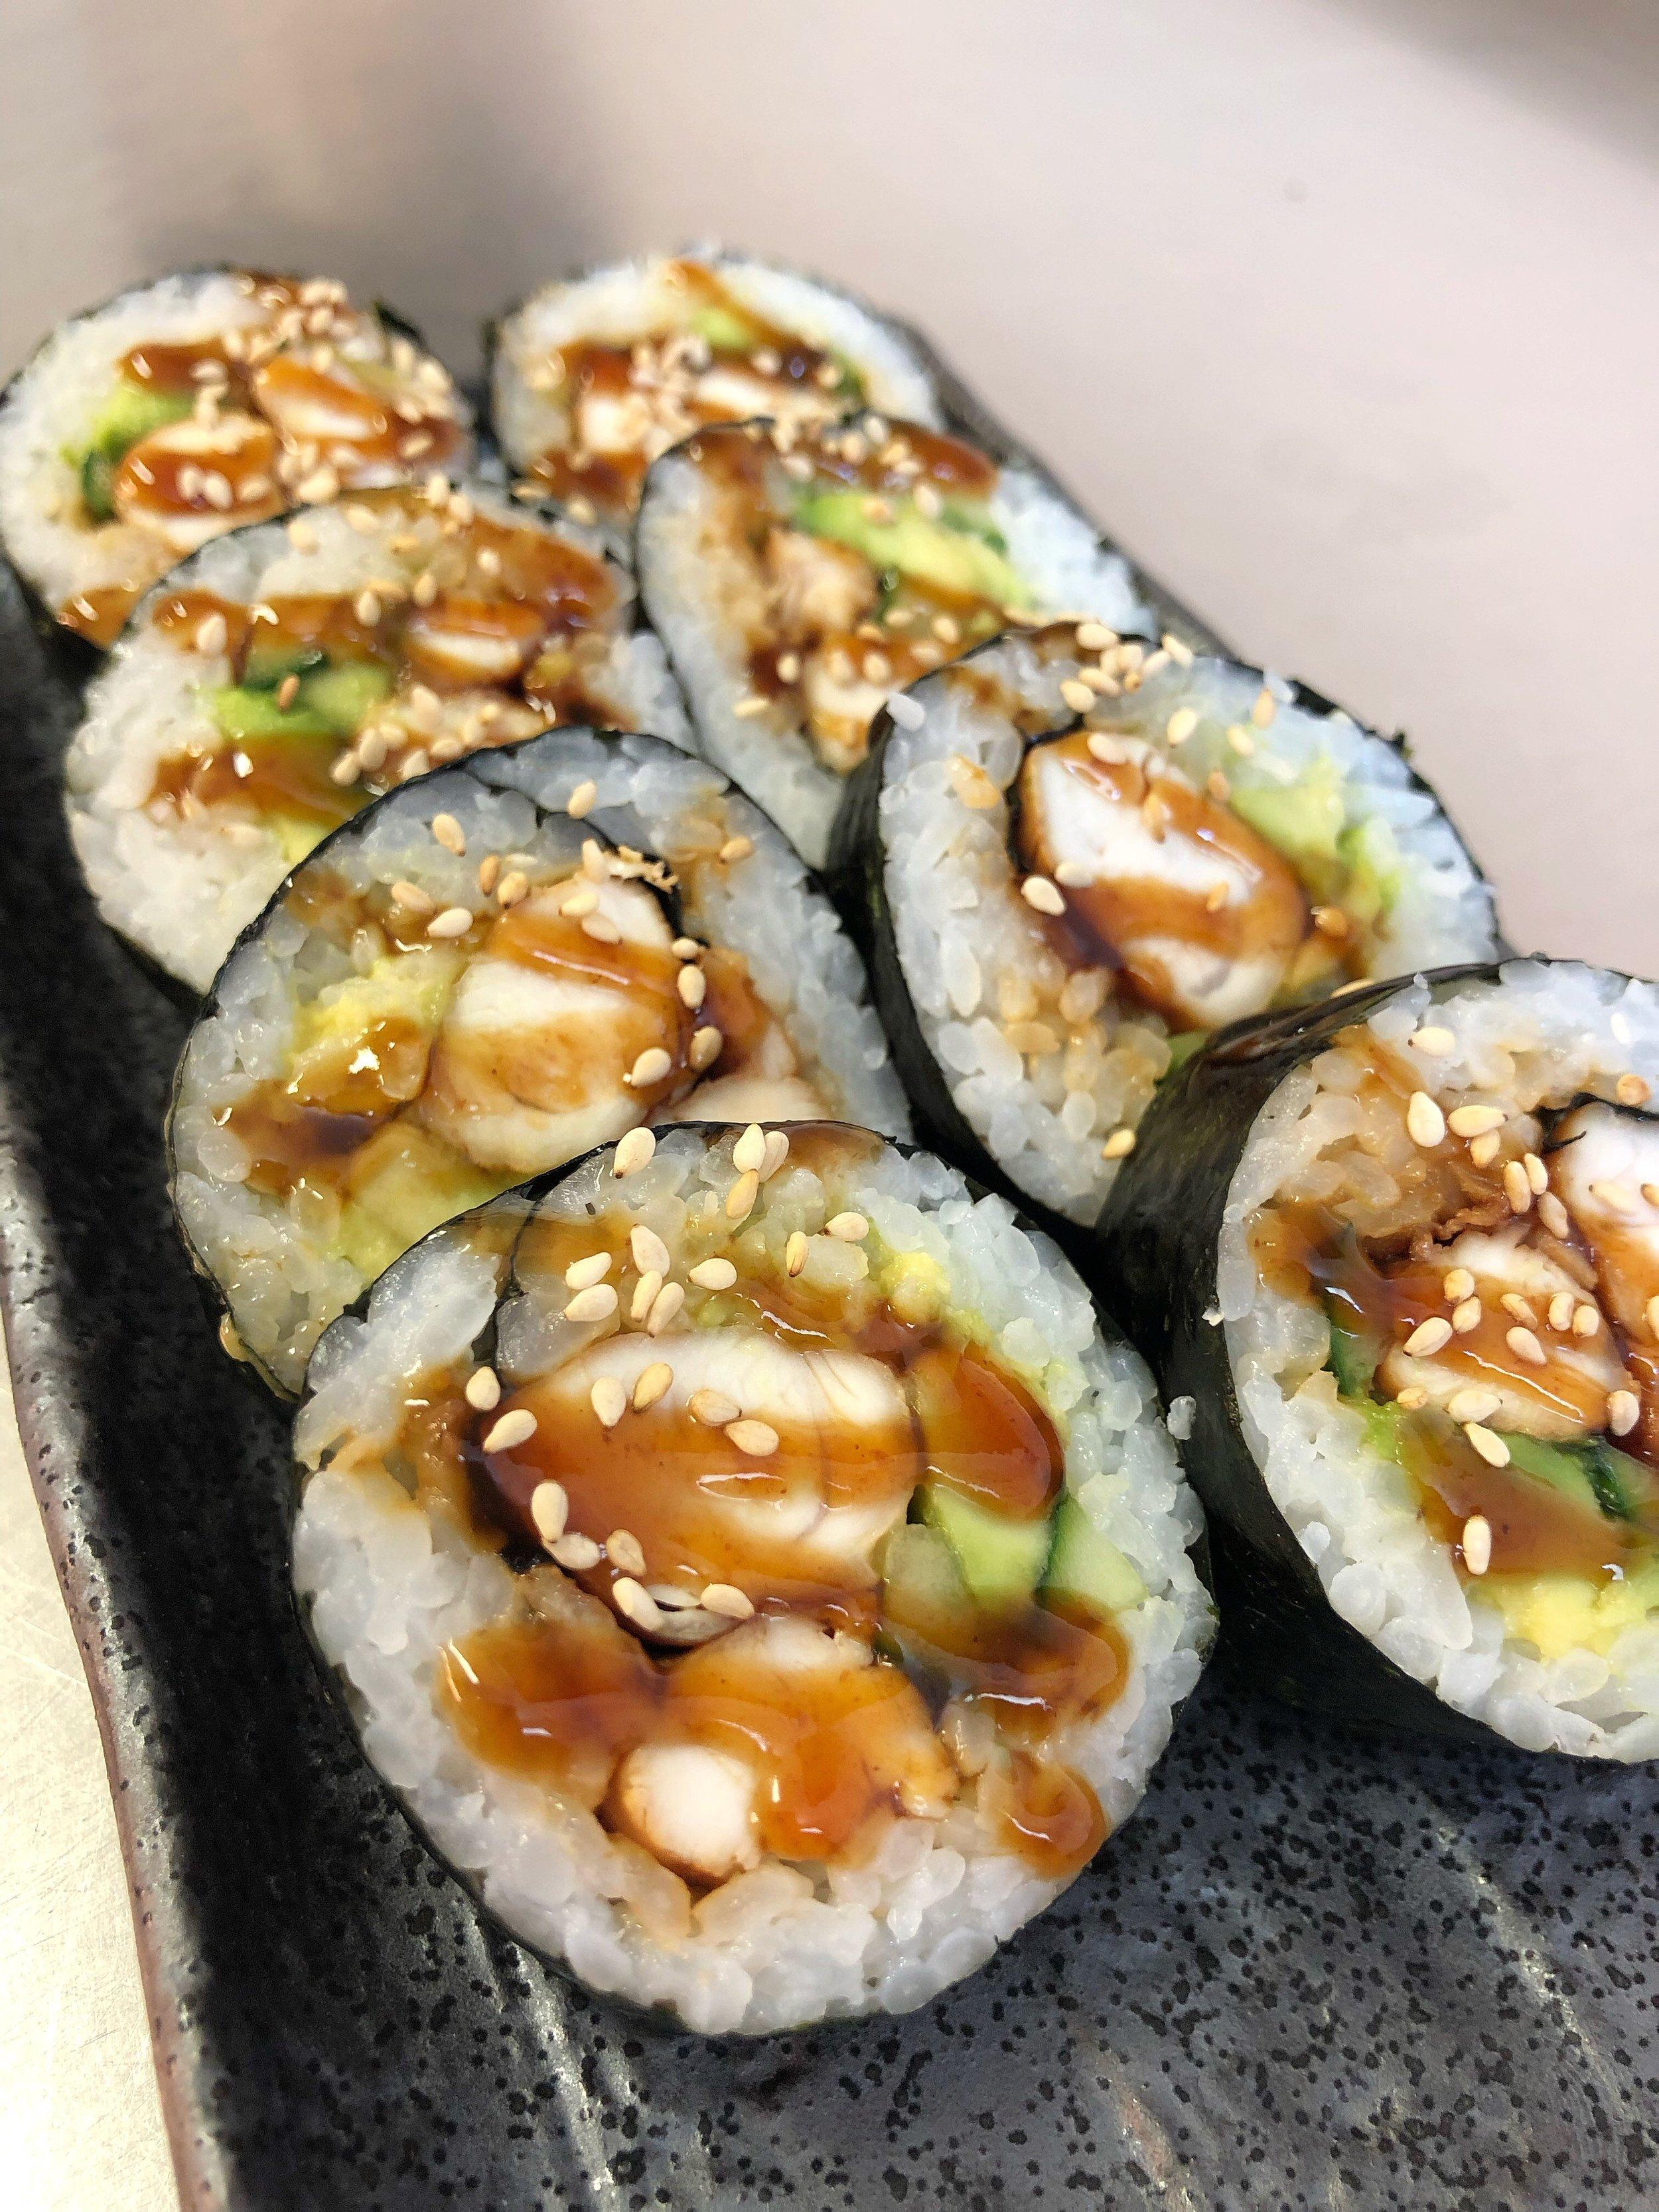 Teriyaki Chicken Futomaki - £6.50